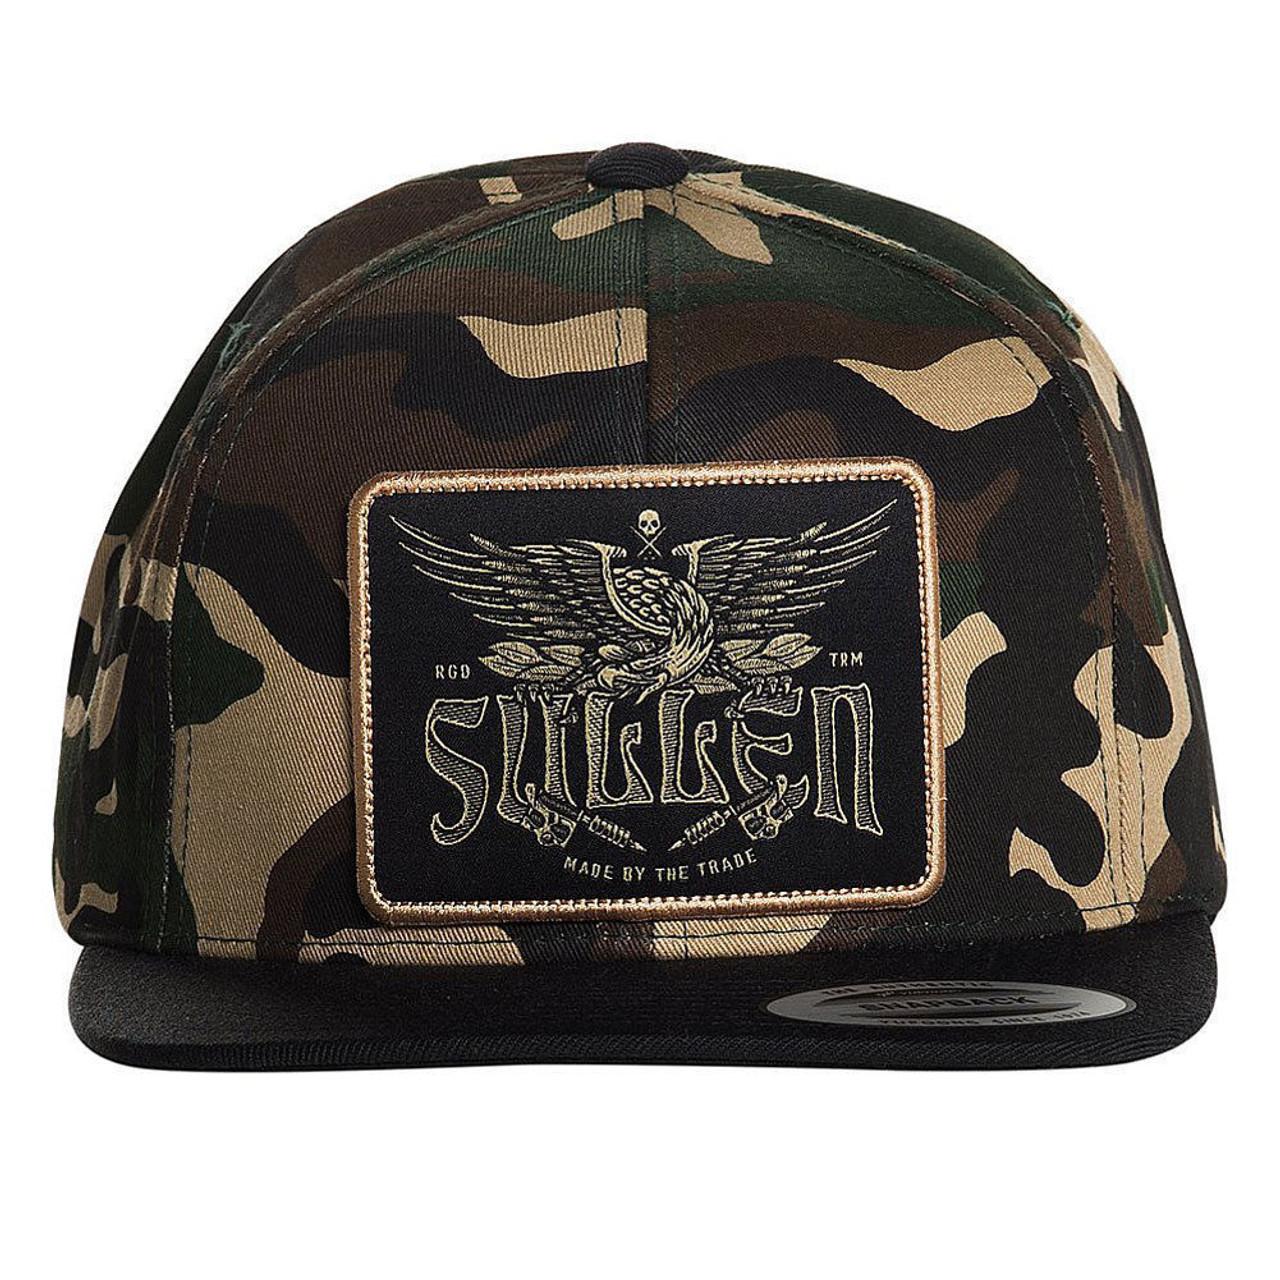 77e7c49d Sullen Clothing Eagle Tradition Urban Camouflage Snapback Cap Hat  SCA2003-CAMO